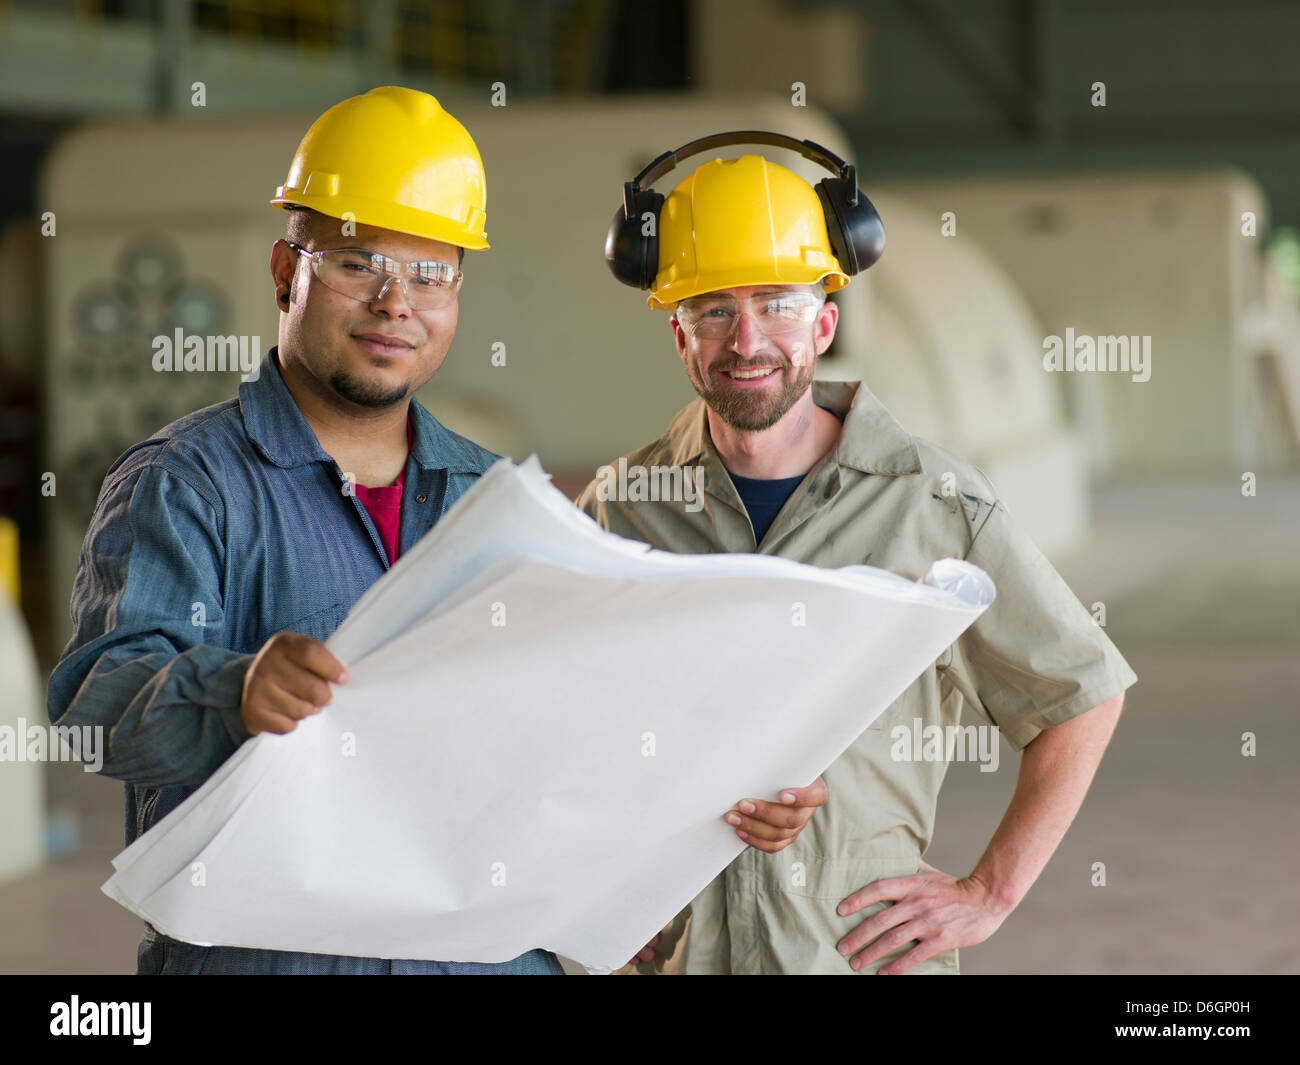 Engineers reading blueprints on site - Stock Image